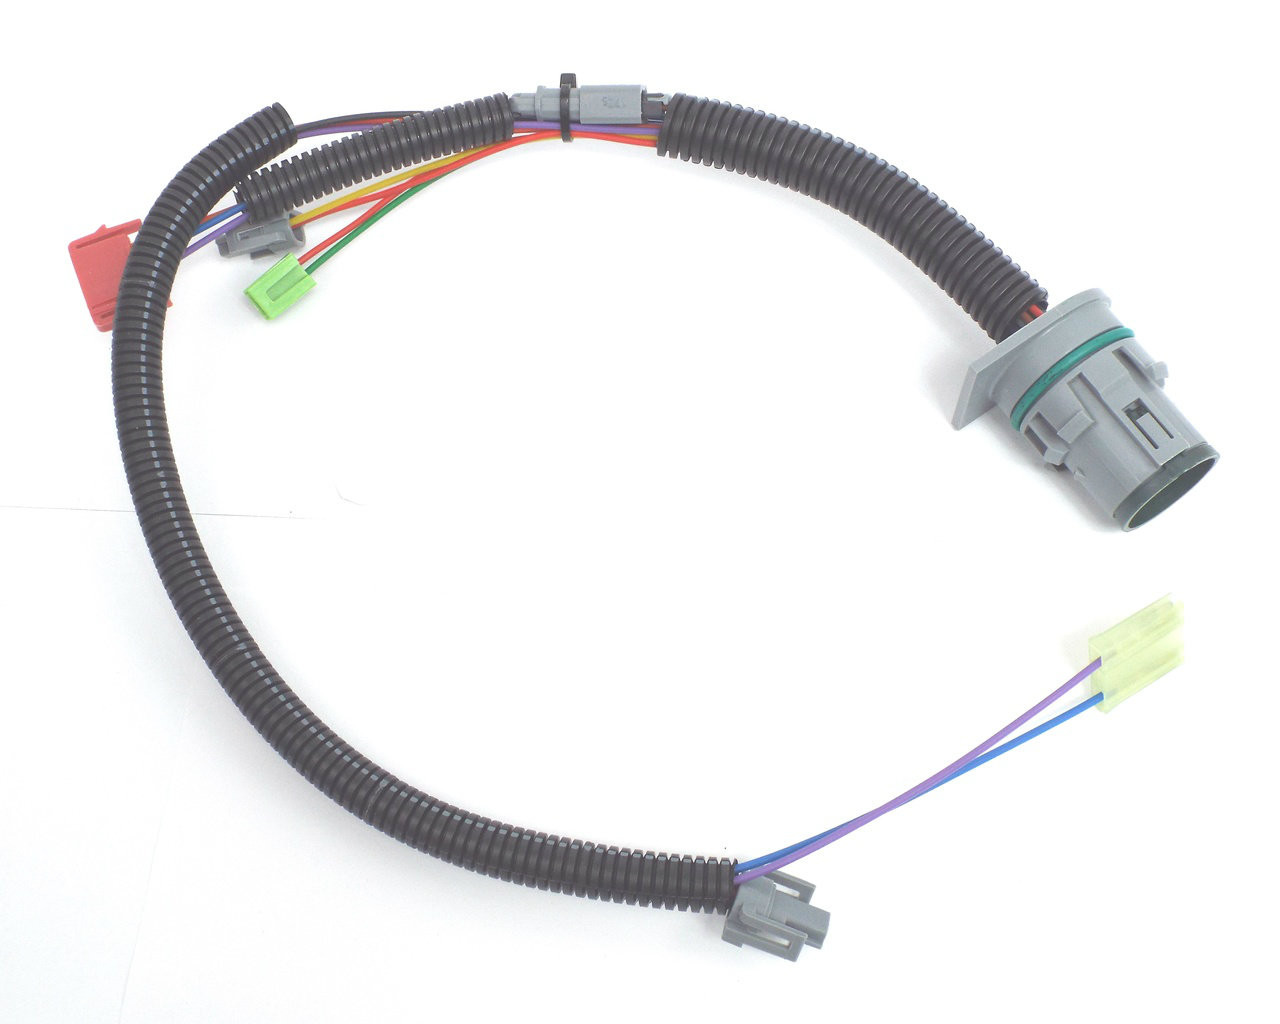 wiring diagram 4l80e transmission solenoid wiring library 4l80e shift solenoid diagram [ 1280 x 1024 Pixel ]